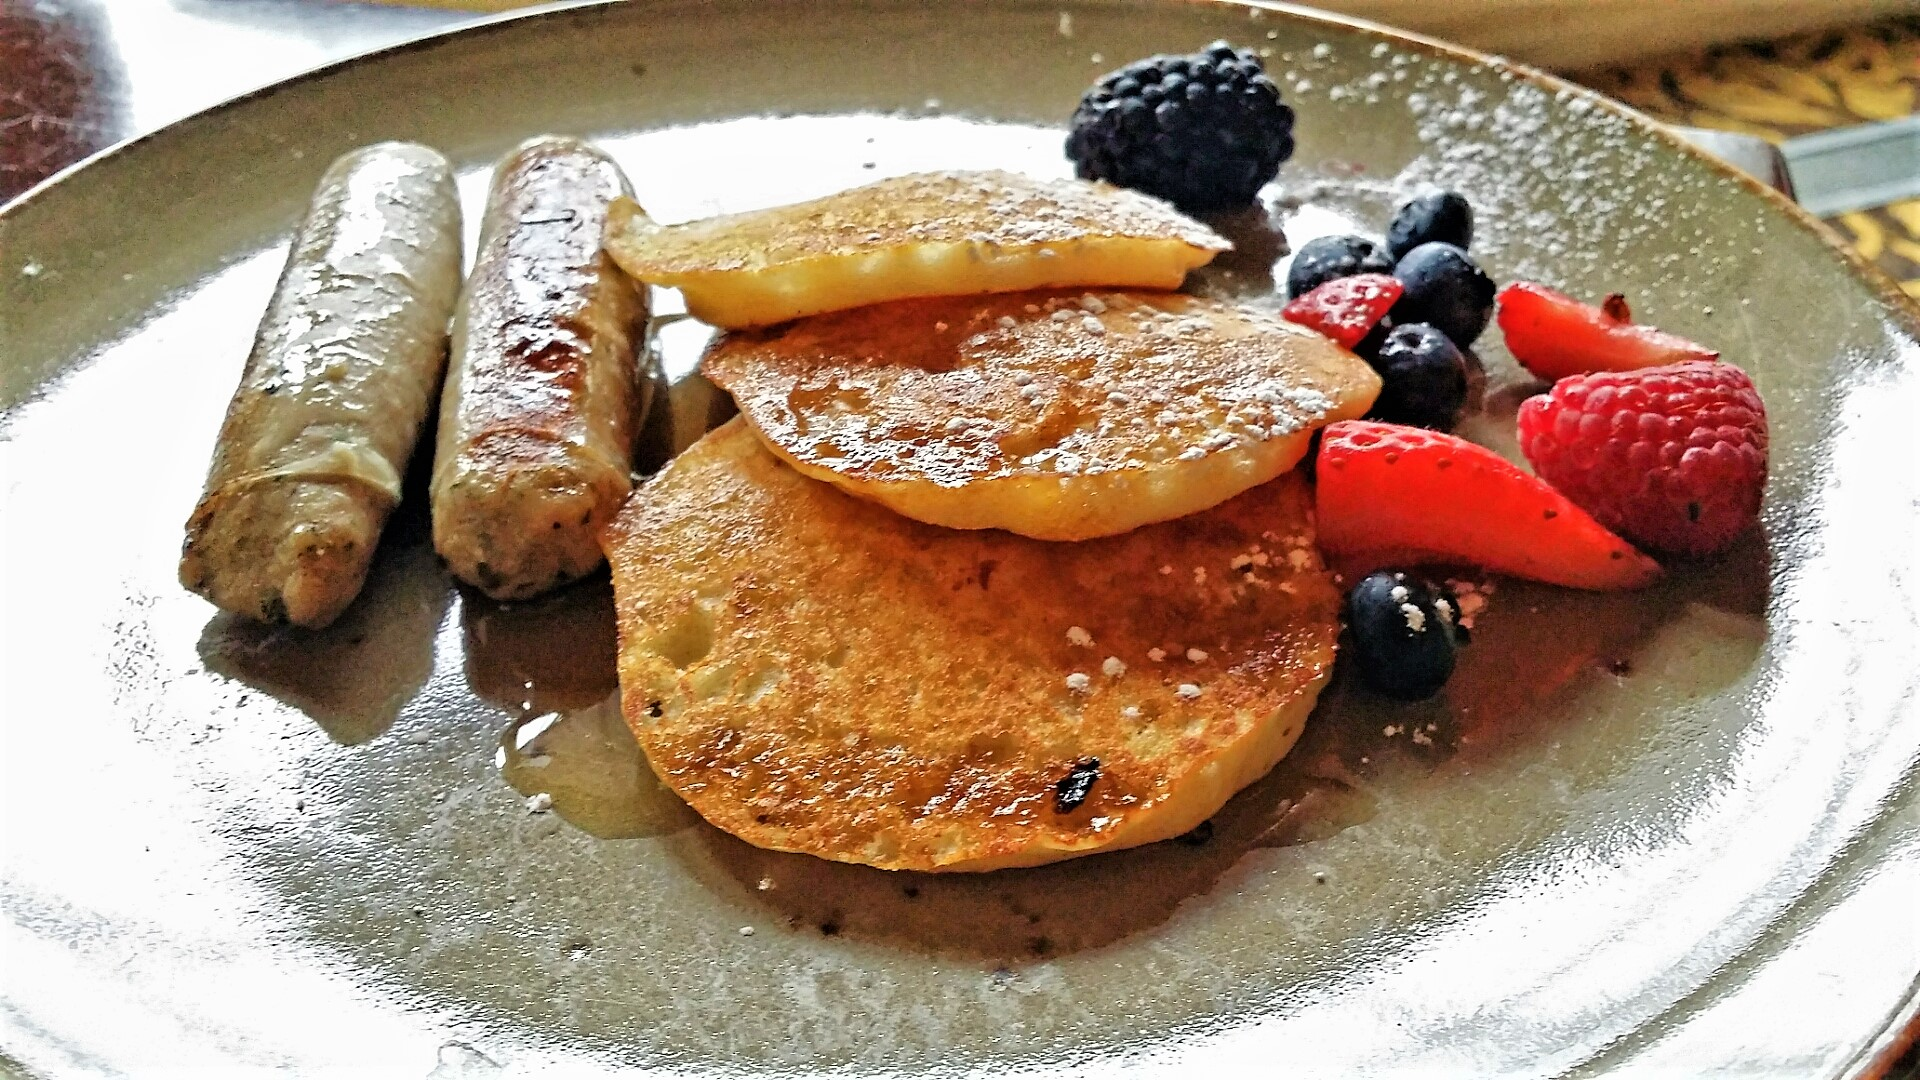 Kids Pancakes, The Harvest Room, Fairmont Hotel Macdonald